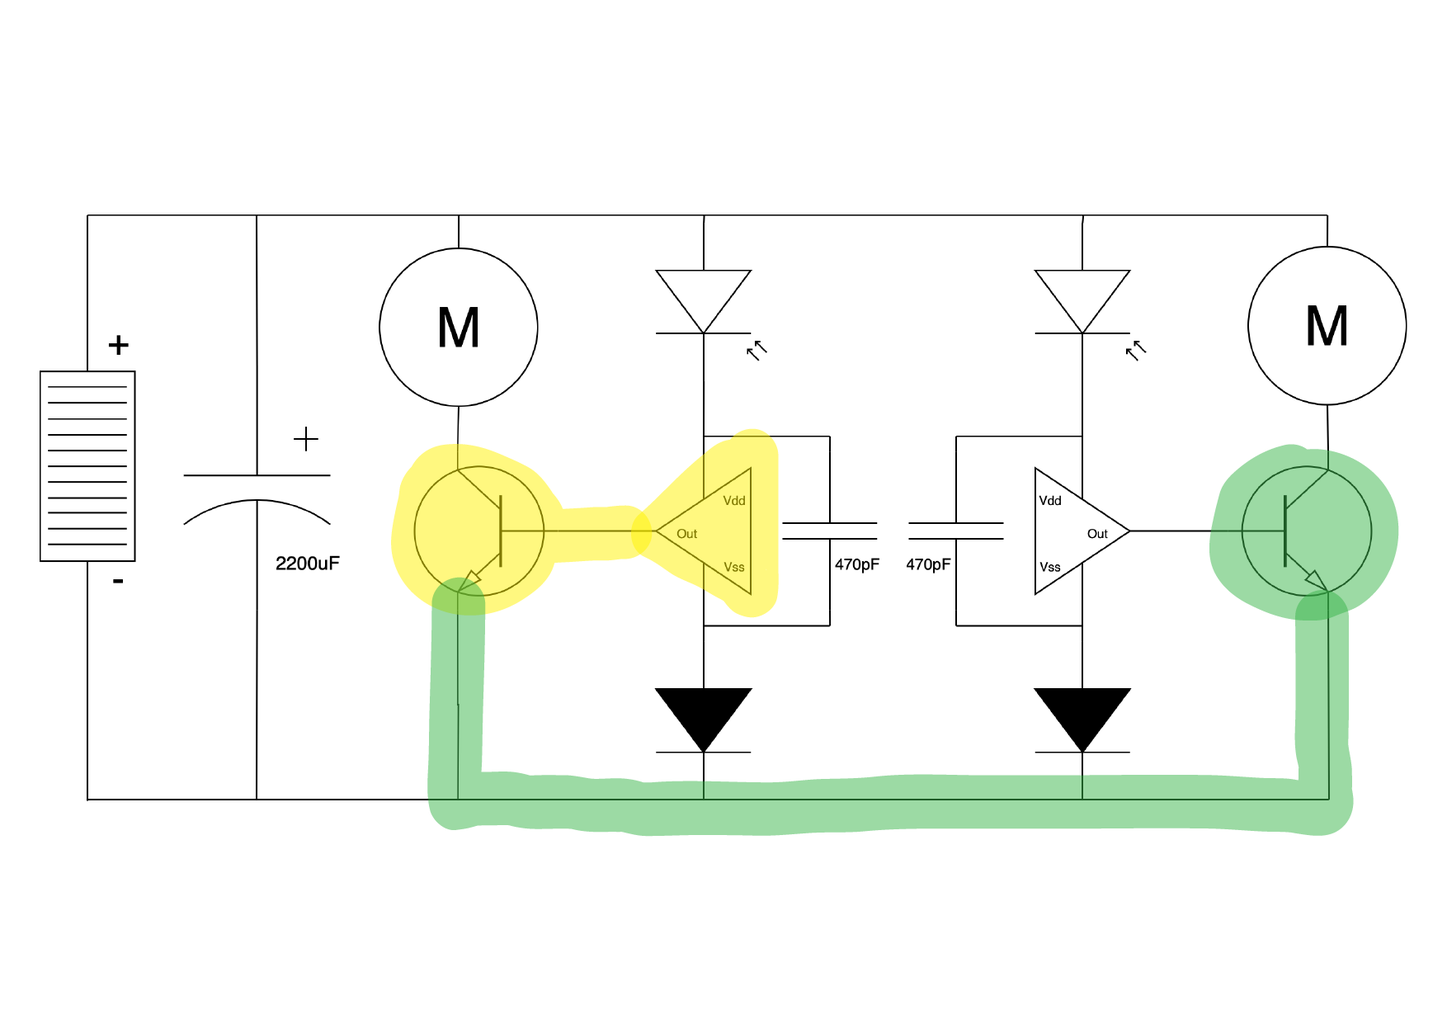 Freeforming the Circuit 3: